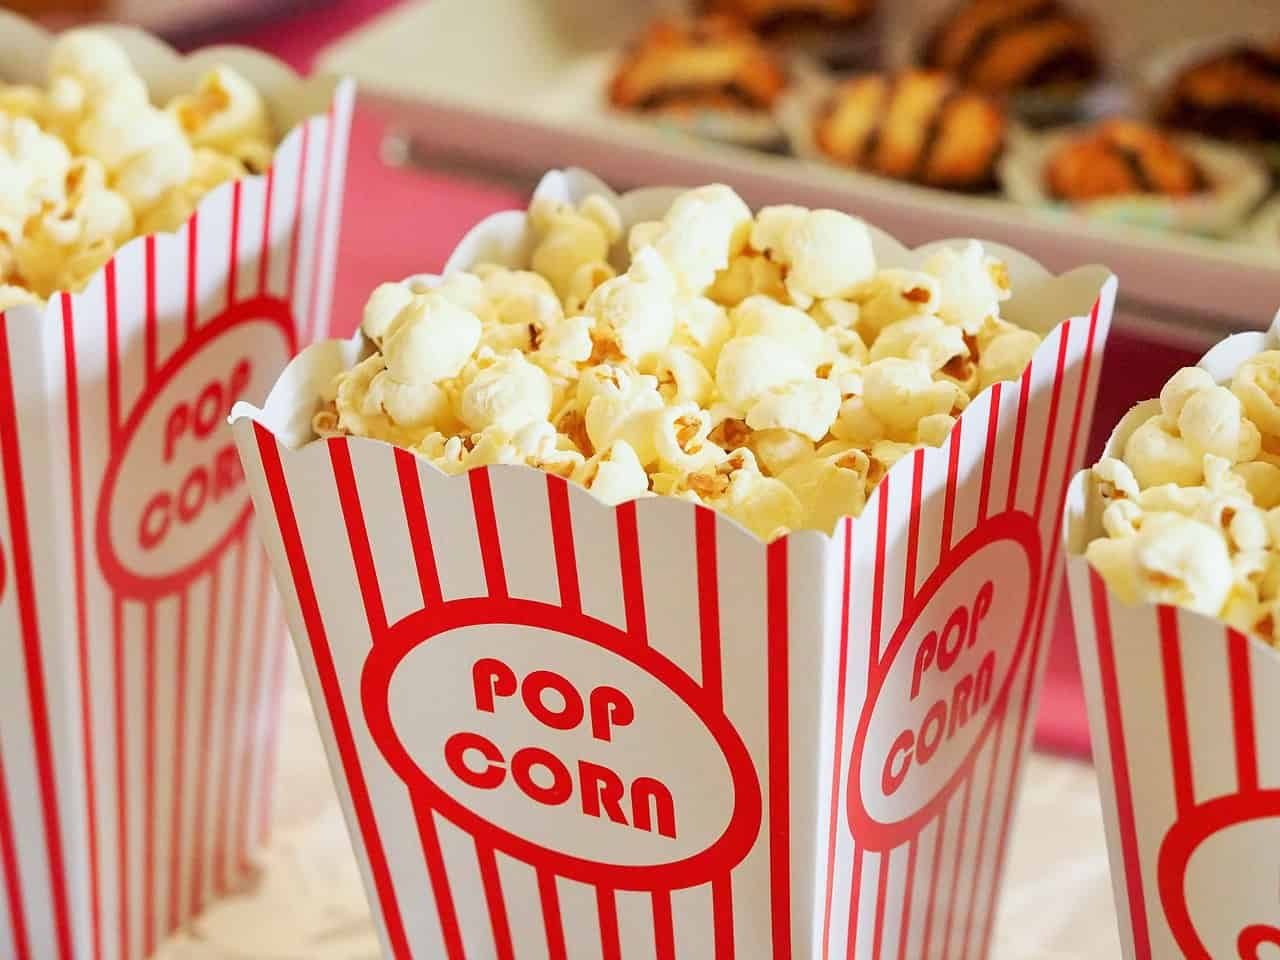 https://cdn.pixabay.com/photo/2015/12/09/17/12/popcorn-1085072_1280.jpg Photo